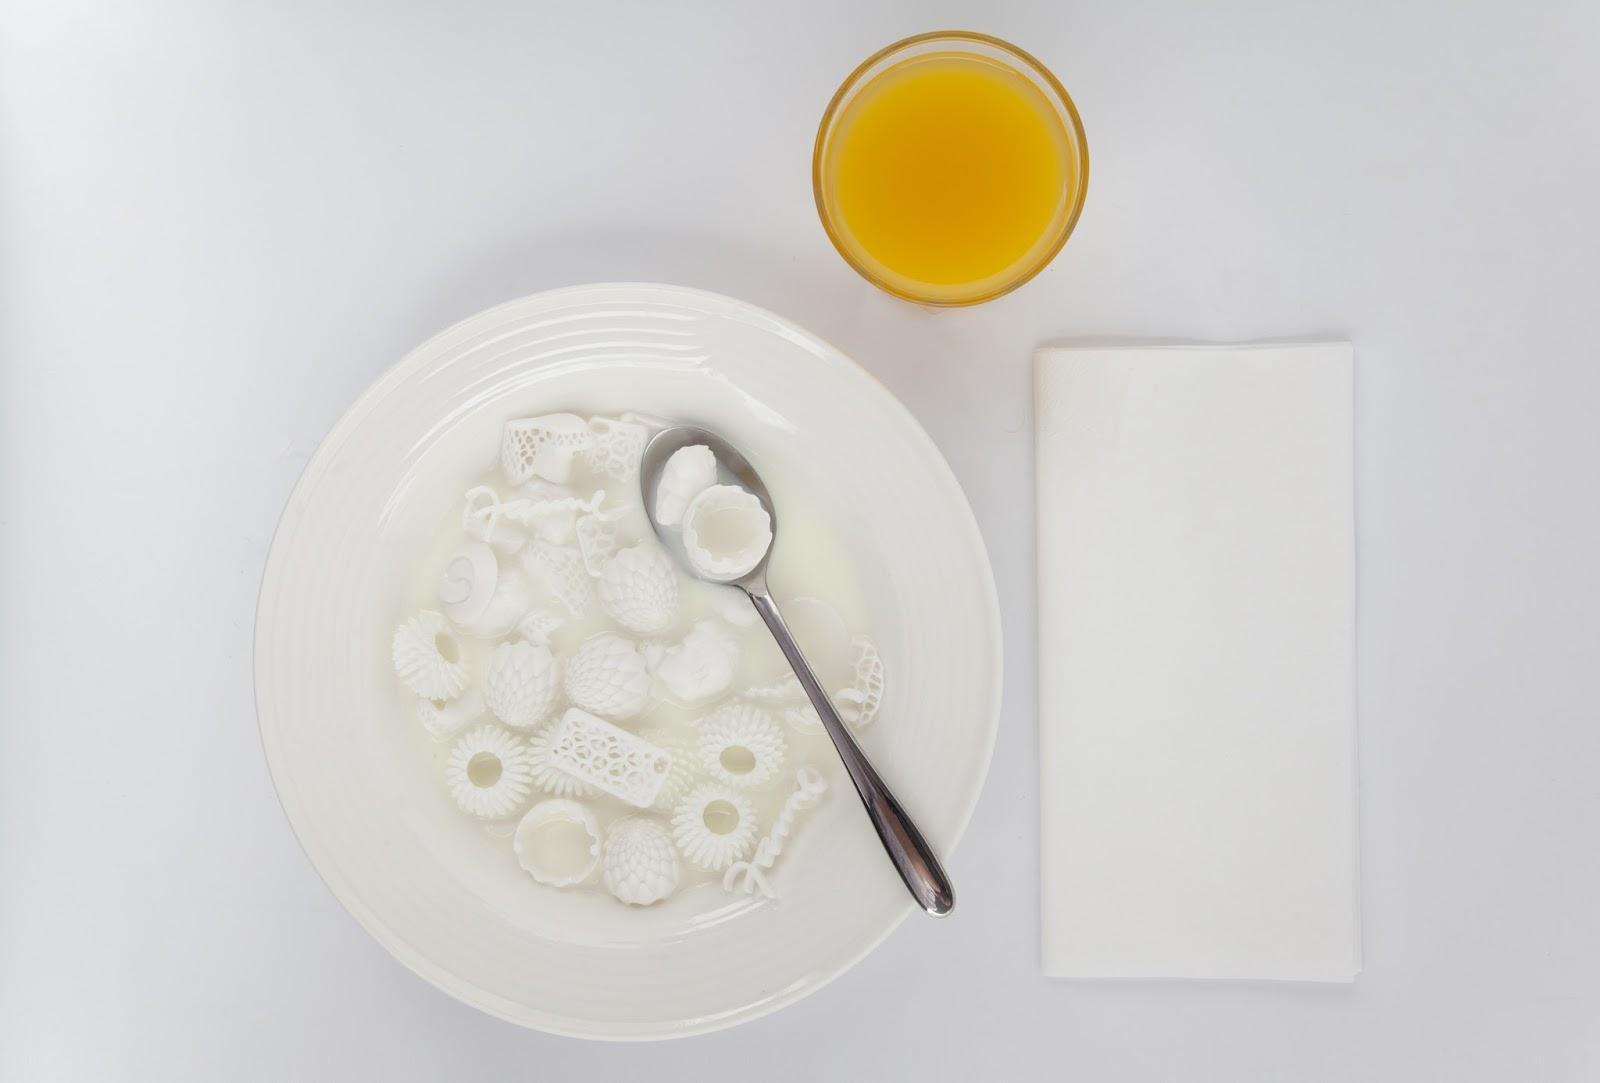 comida-direto-da-impressora-3d-1